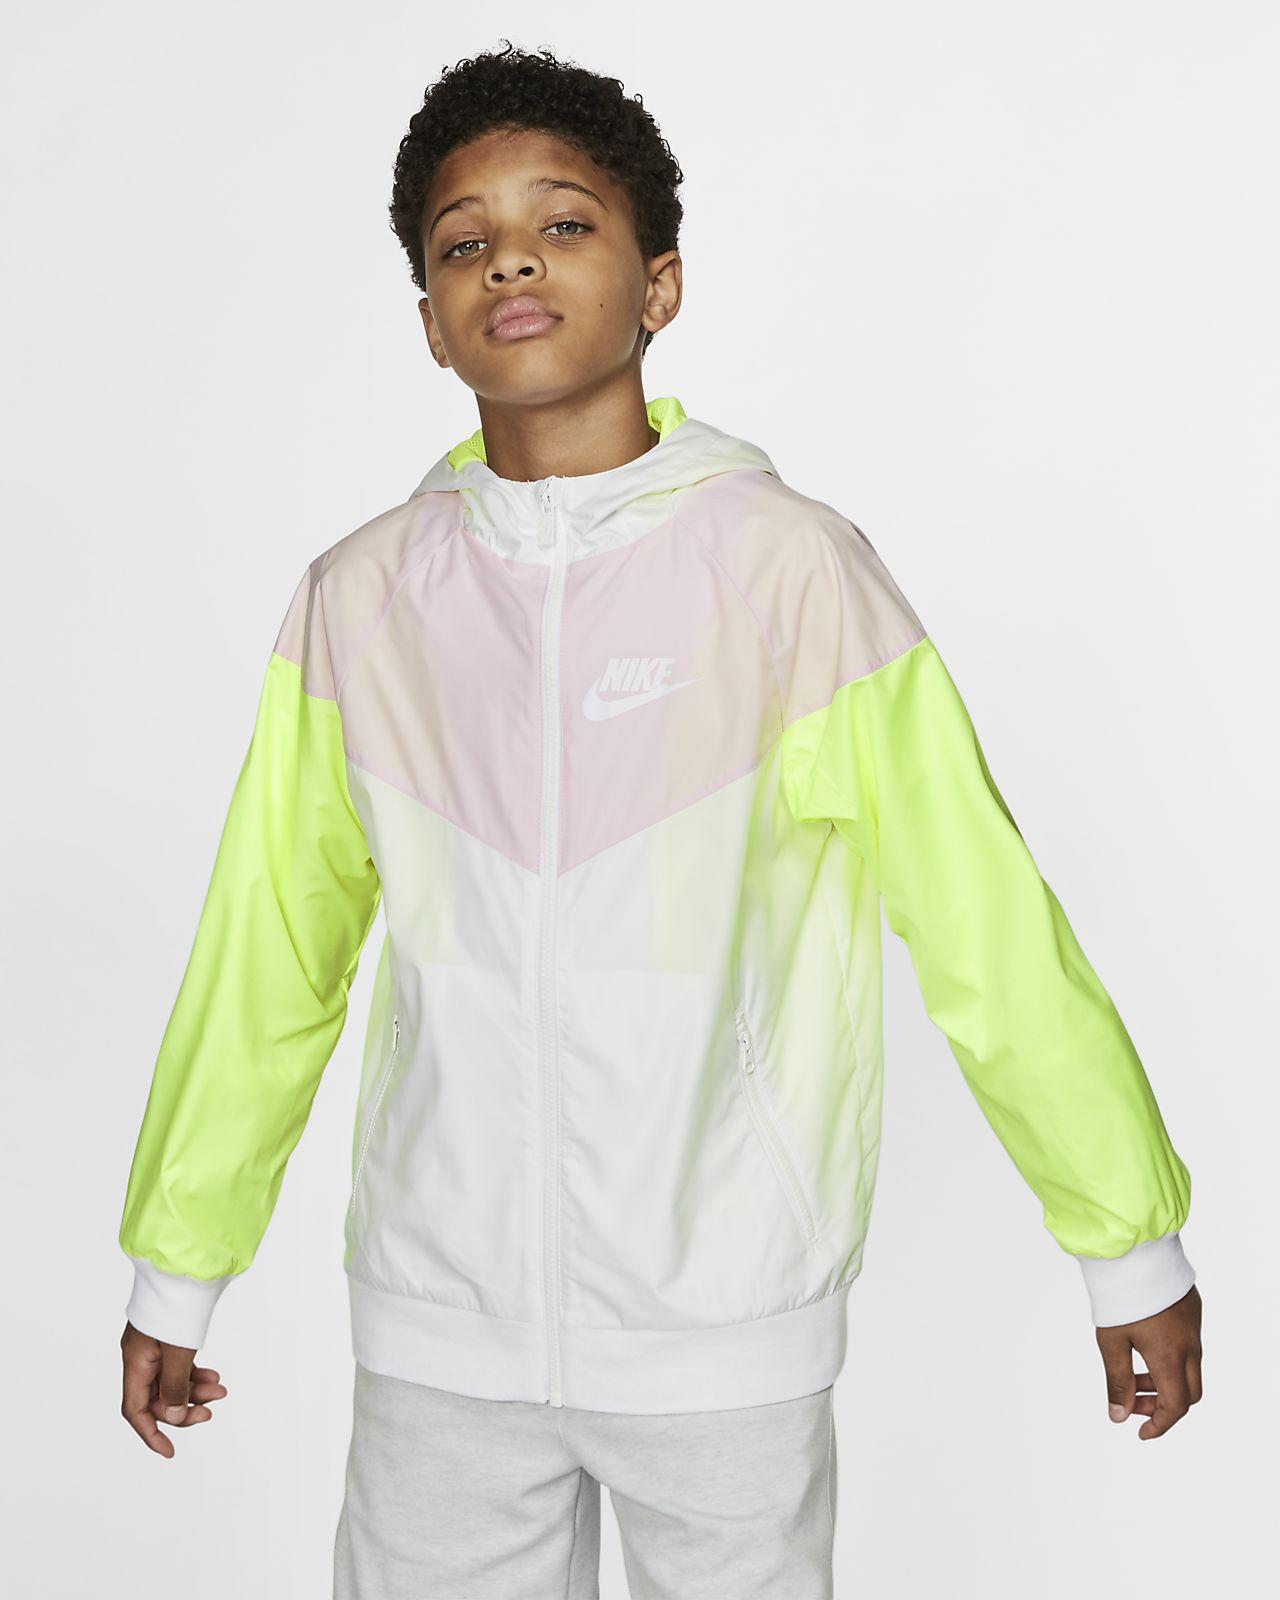 431f99e1 Nike Sportswear Windrunner Big Kids' (Boys') Jacket. Nike.com